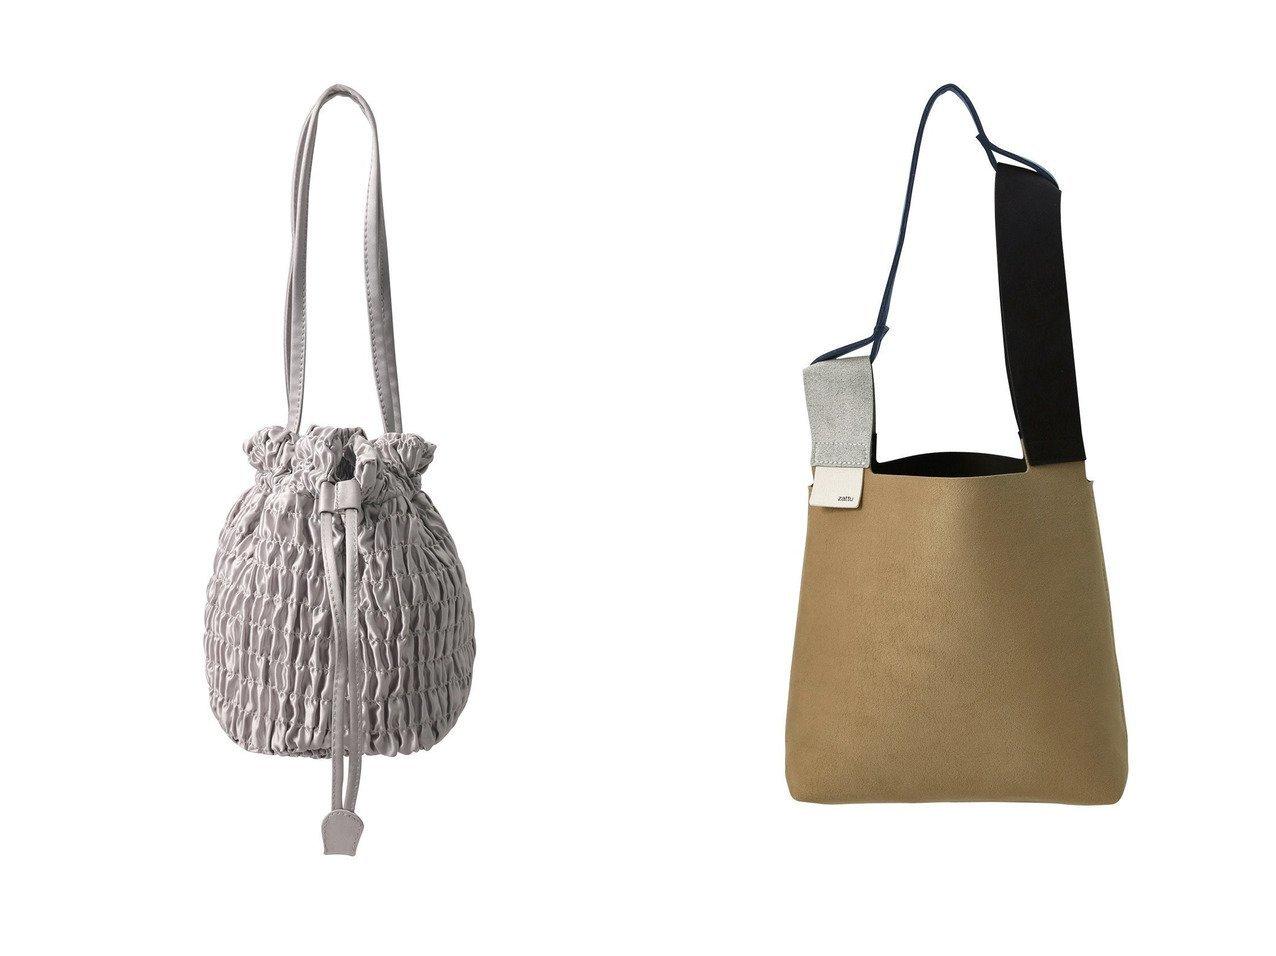 【martinique/マルティニーク】の【hai】シルクバケツバッグ&【zattu/ザッツ】のCONCH マイクロファイバースエードハンドバッグ バッグ・鞄のおすすめ!人気、トレンド・レディースファッションの通販 おすすめで人気の流行・トレンド、ファッションの通販商品 メンズファッション・キッズファッション・インテリア・家具・レディースファッション・服の通販 founy(ファニー) https://founy.com/ ファッション Fashion レディースファッション WOMEN バッグ Bag 2021年 2021 2021 春夏 S/S SS Spring/Summer 2021 S/S 春夏 SS Spring/Summer サテン シャーリング シルク ハンドバッグ フォルム 巾着 春 Spring ショルダー スエード |ID:crp329100000015339